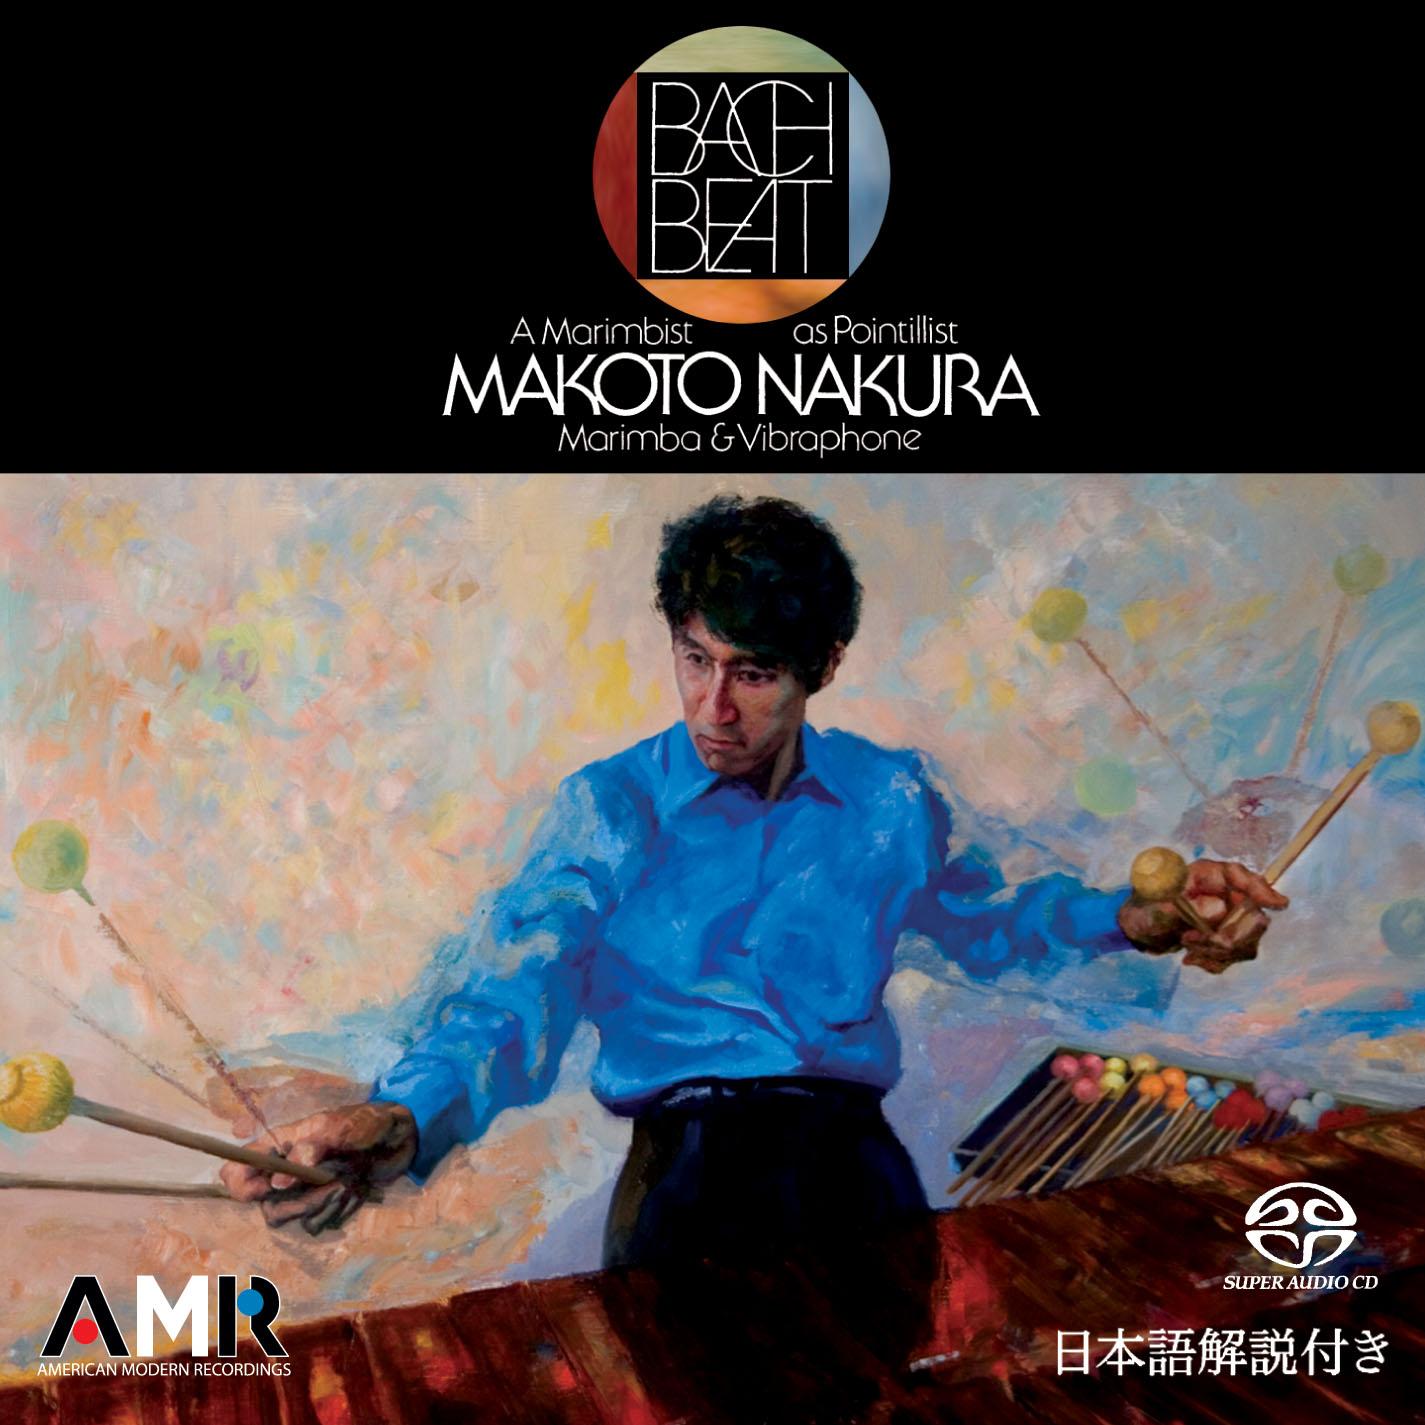 Makoto Nakura - Bach Beat